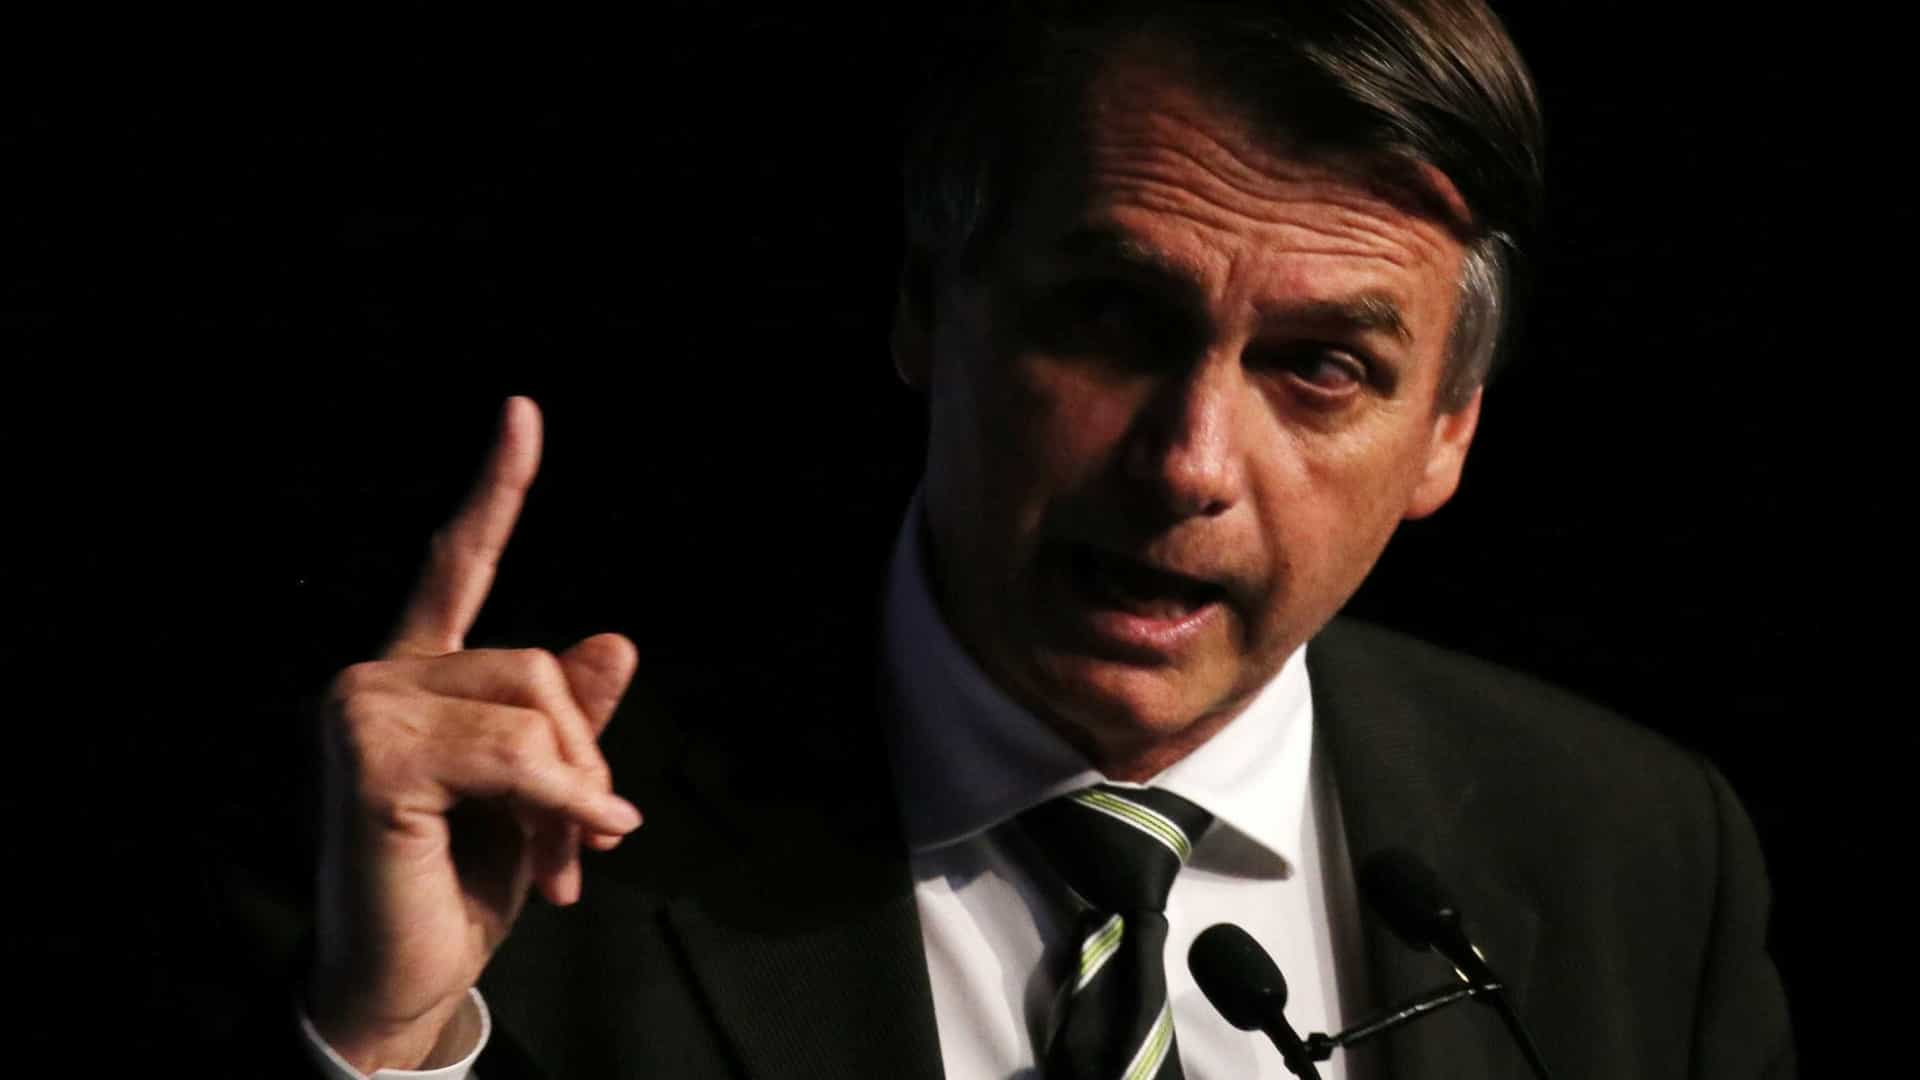 Bolsonaro critica mudanças na campanha de Haddad